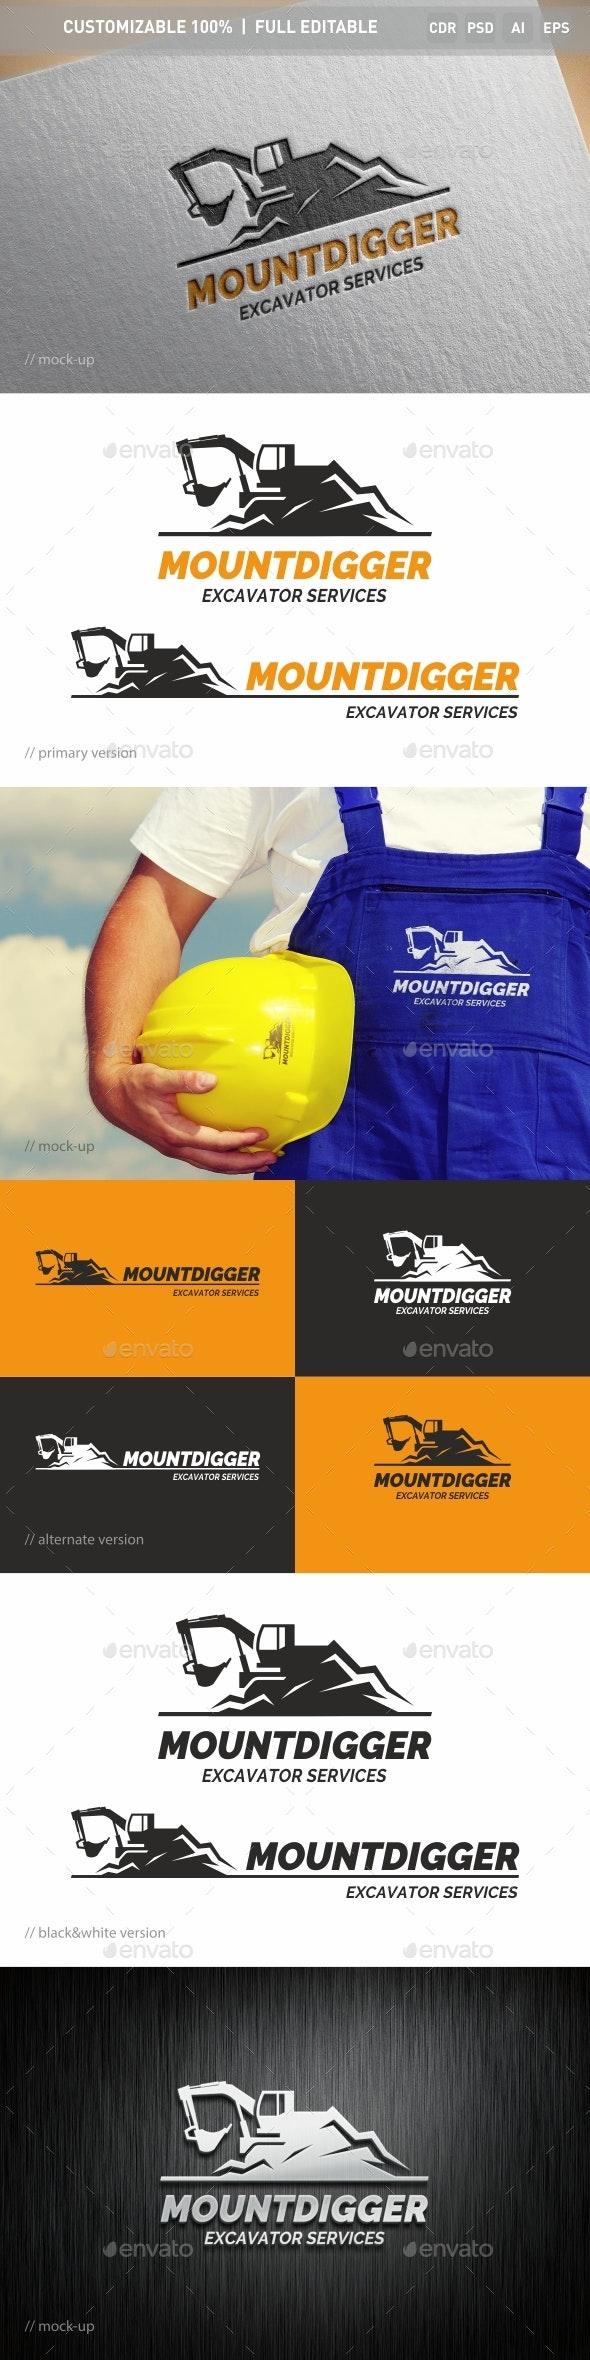 Mountdigger Logo Template - Objects Logo Templates